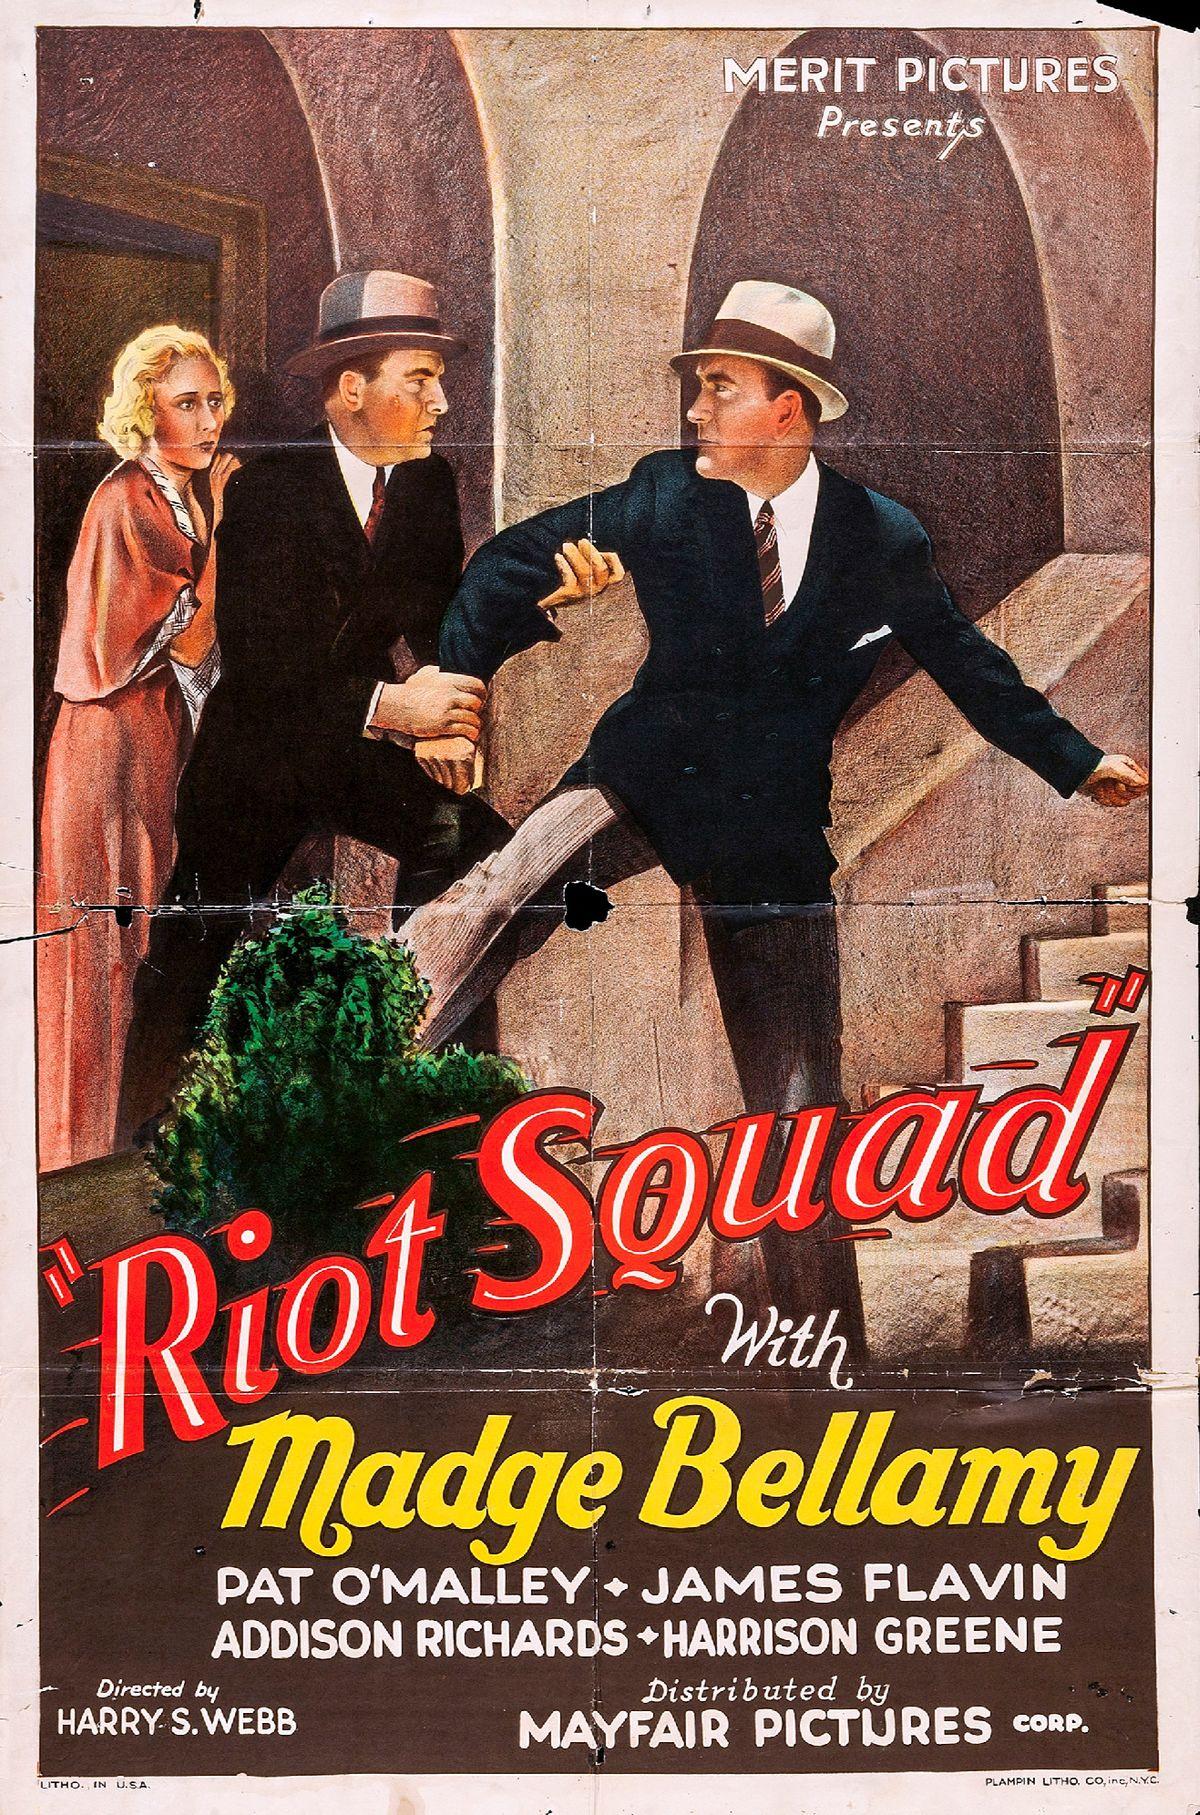 Judge Roy Moore Wikipedia >> Riot Squad (film) - Wikipedia